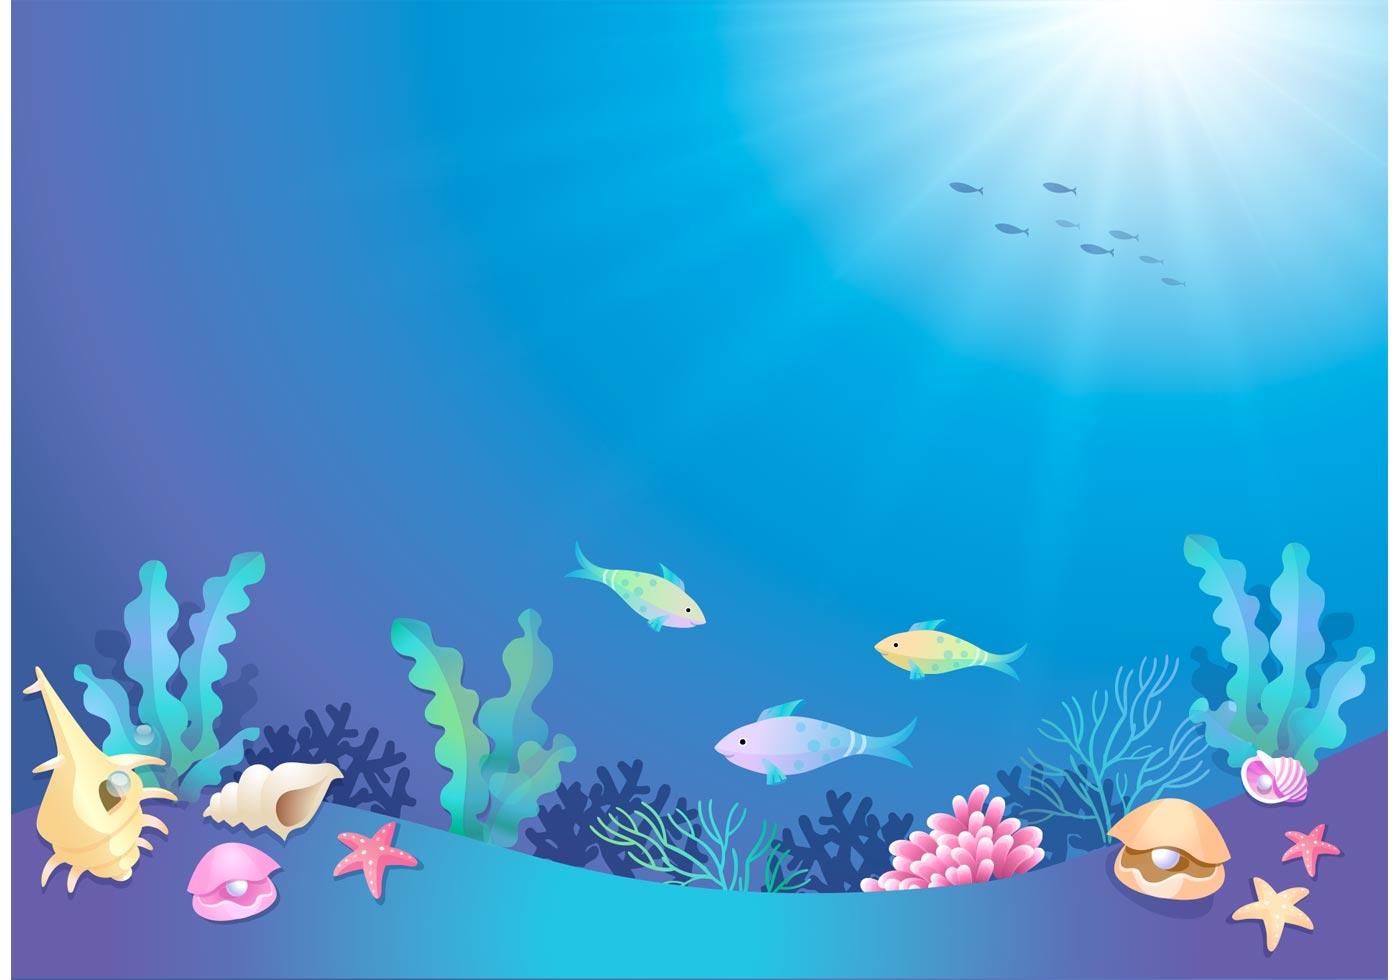 Free Vector Cartoon Underwater World - Download Free ...